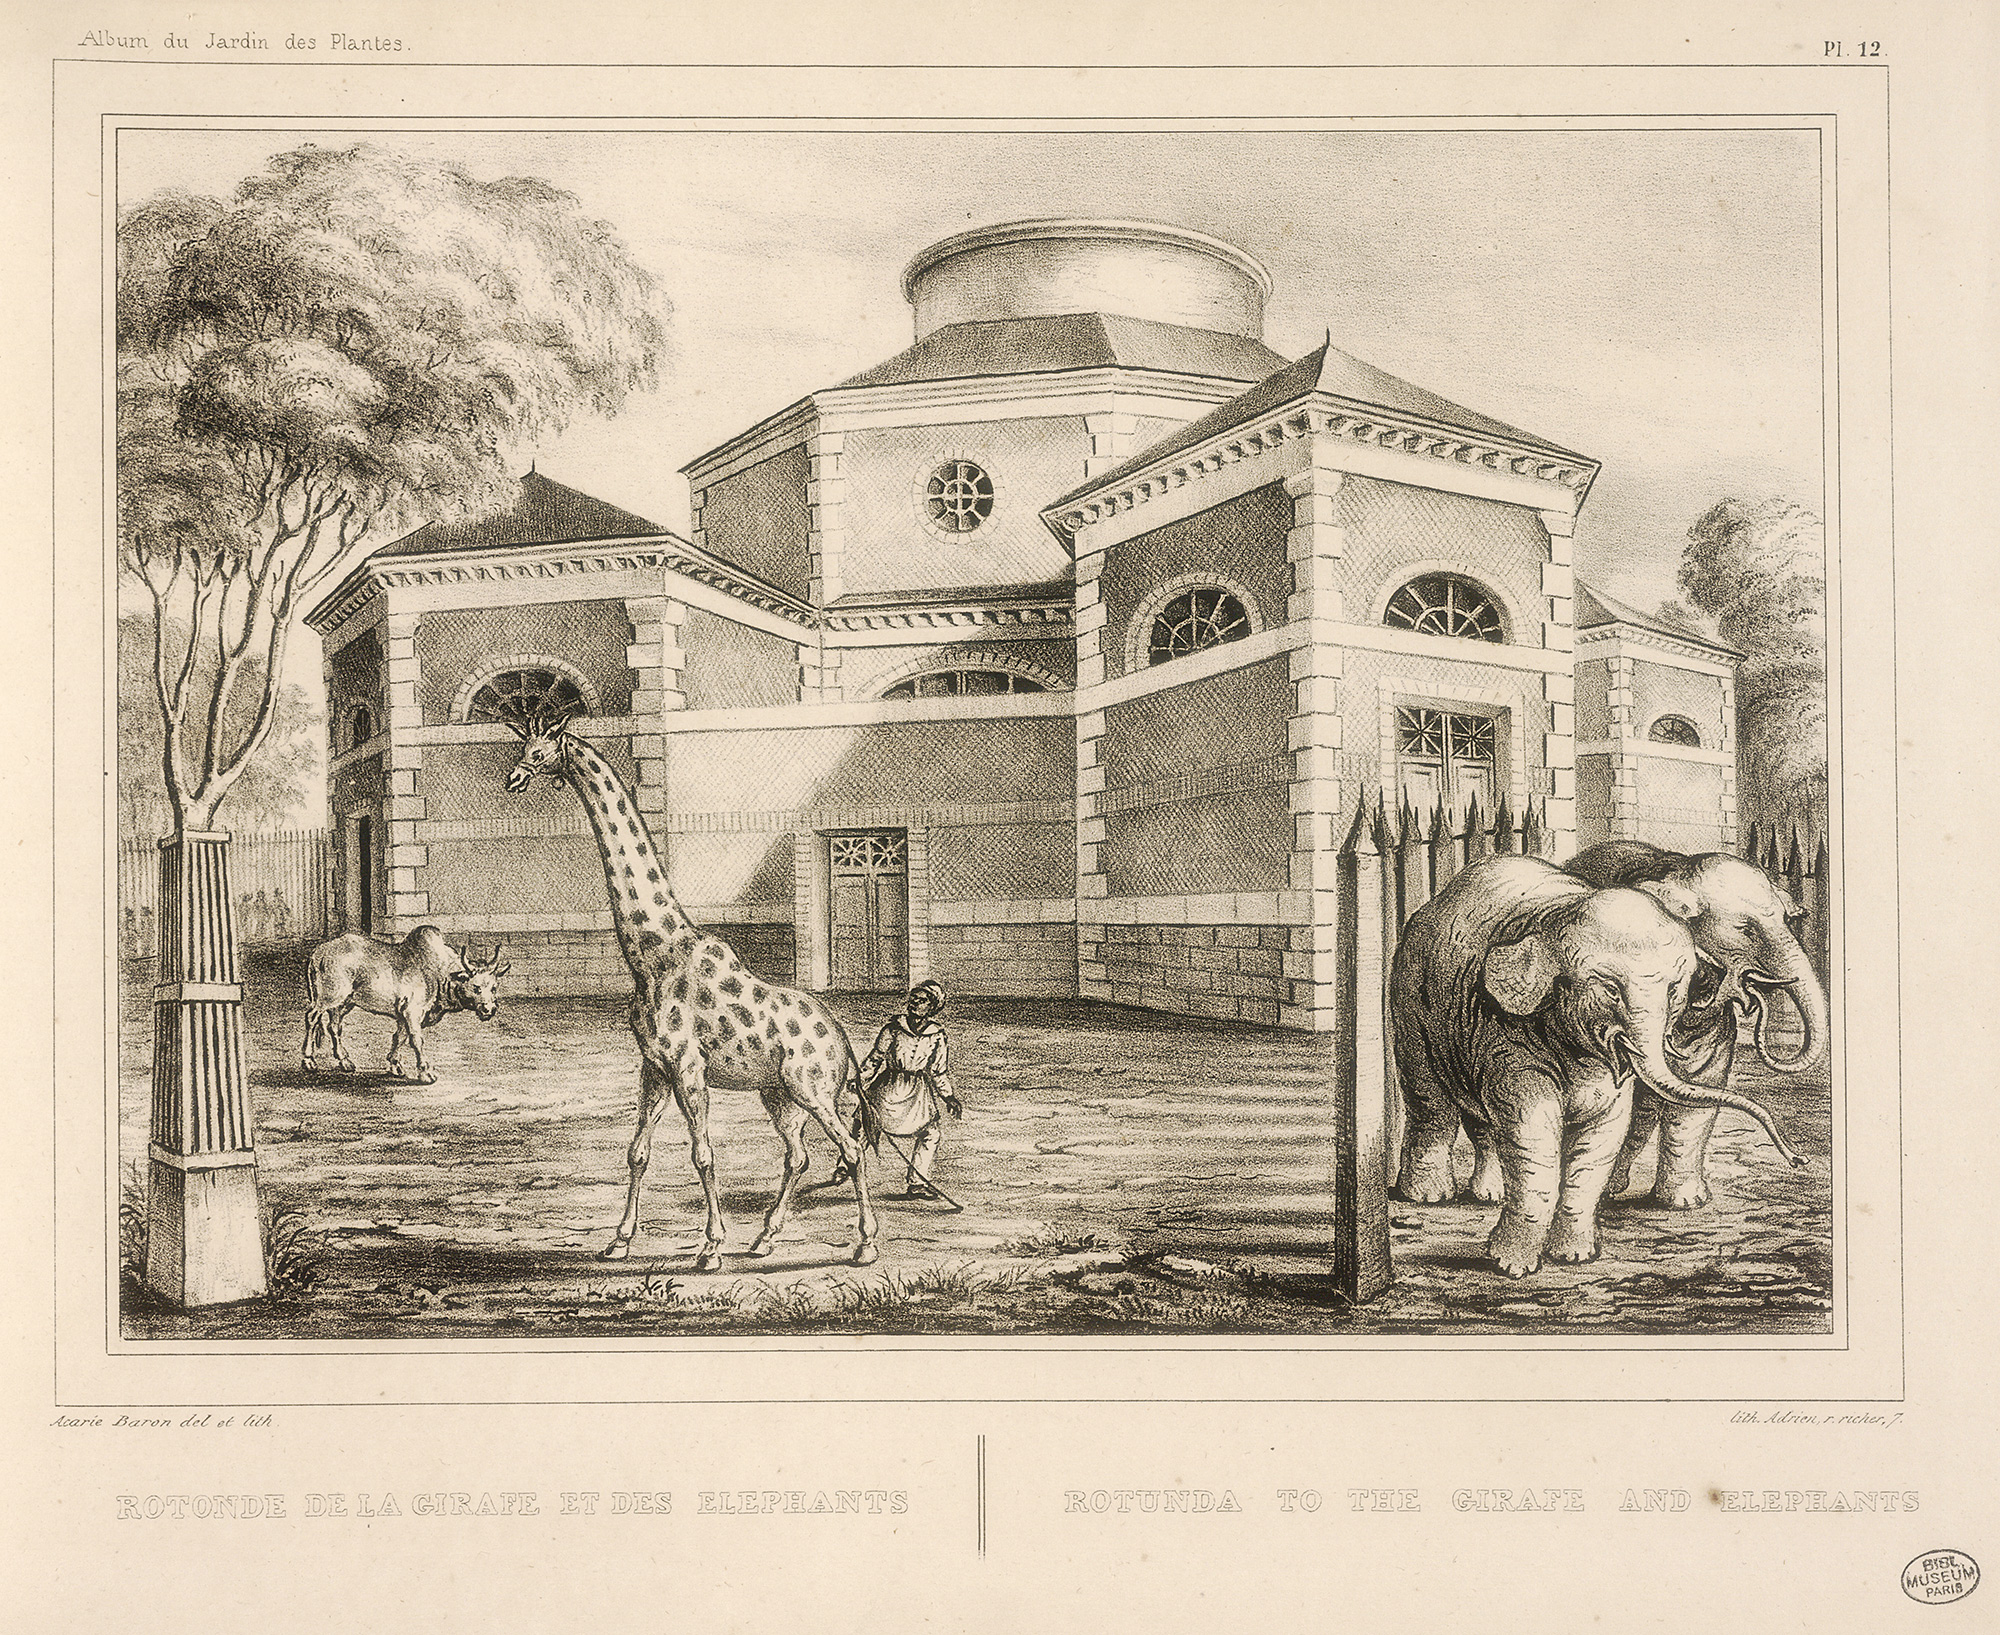 History Of The Ménagerie, The Zoo Of The Jardin Des Plantes ... tout Serre De Jardin Amazon